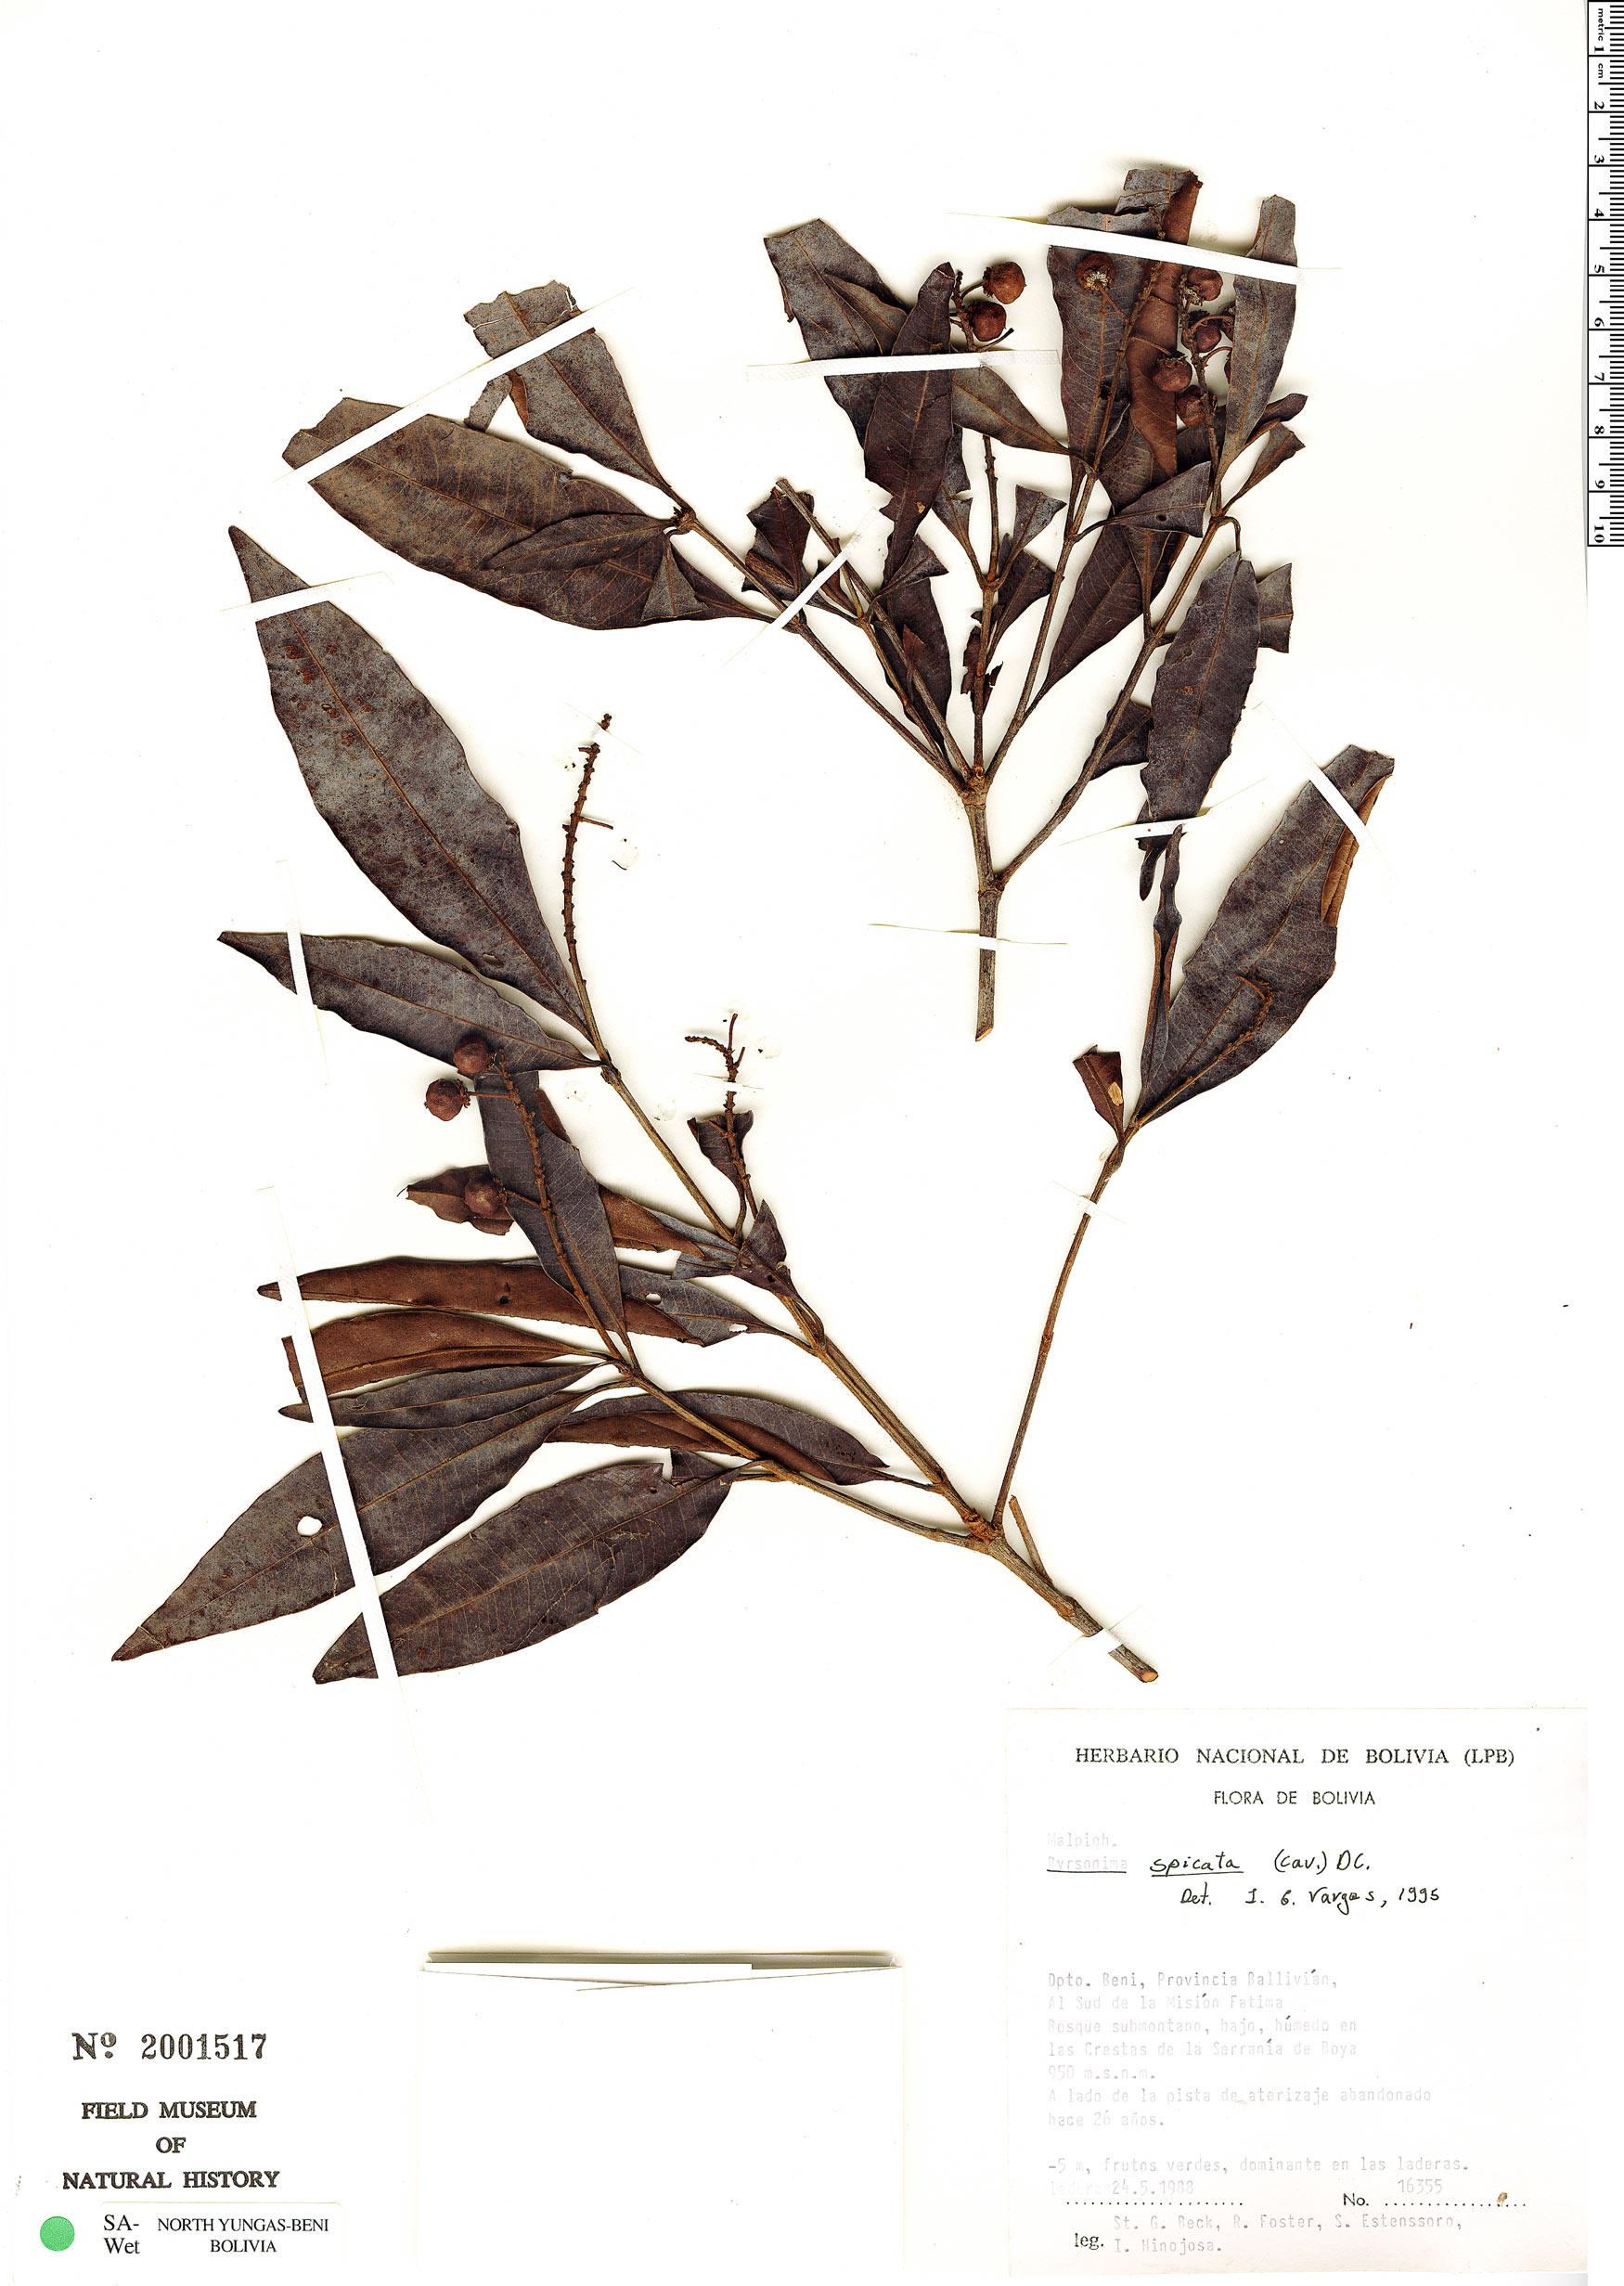 Espécimen: Byrsonima spicata